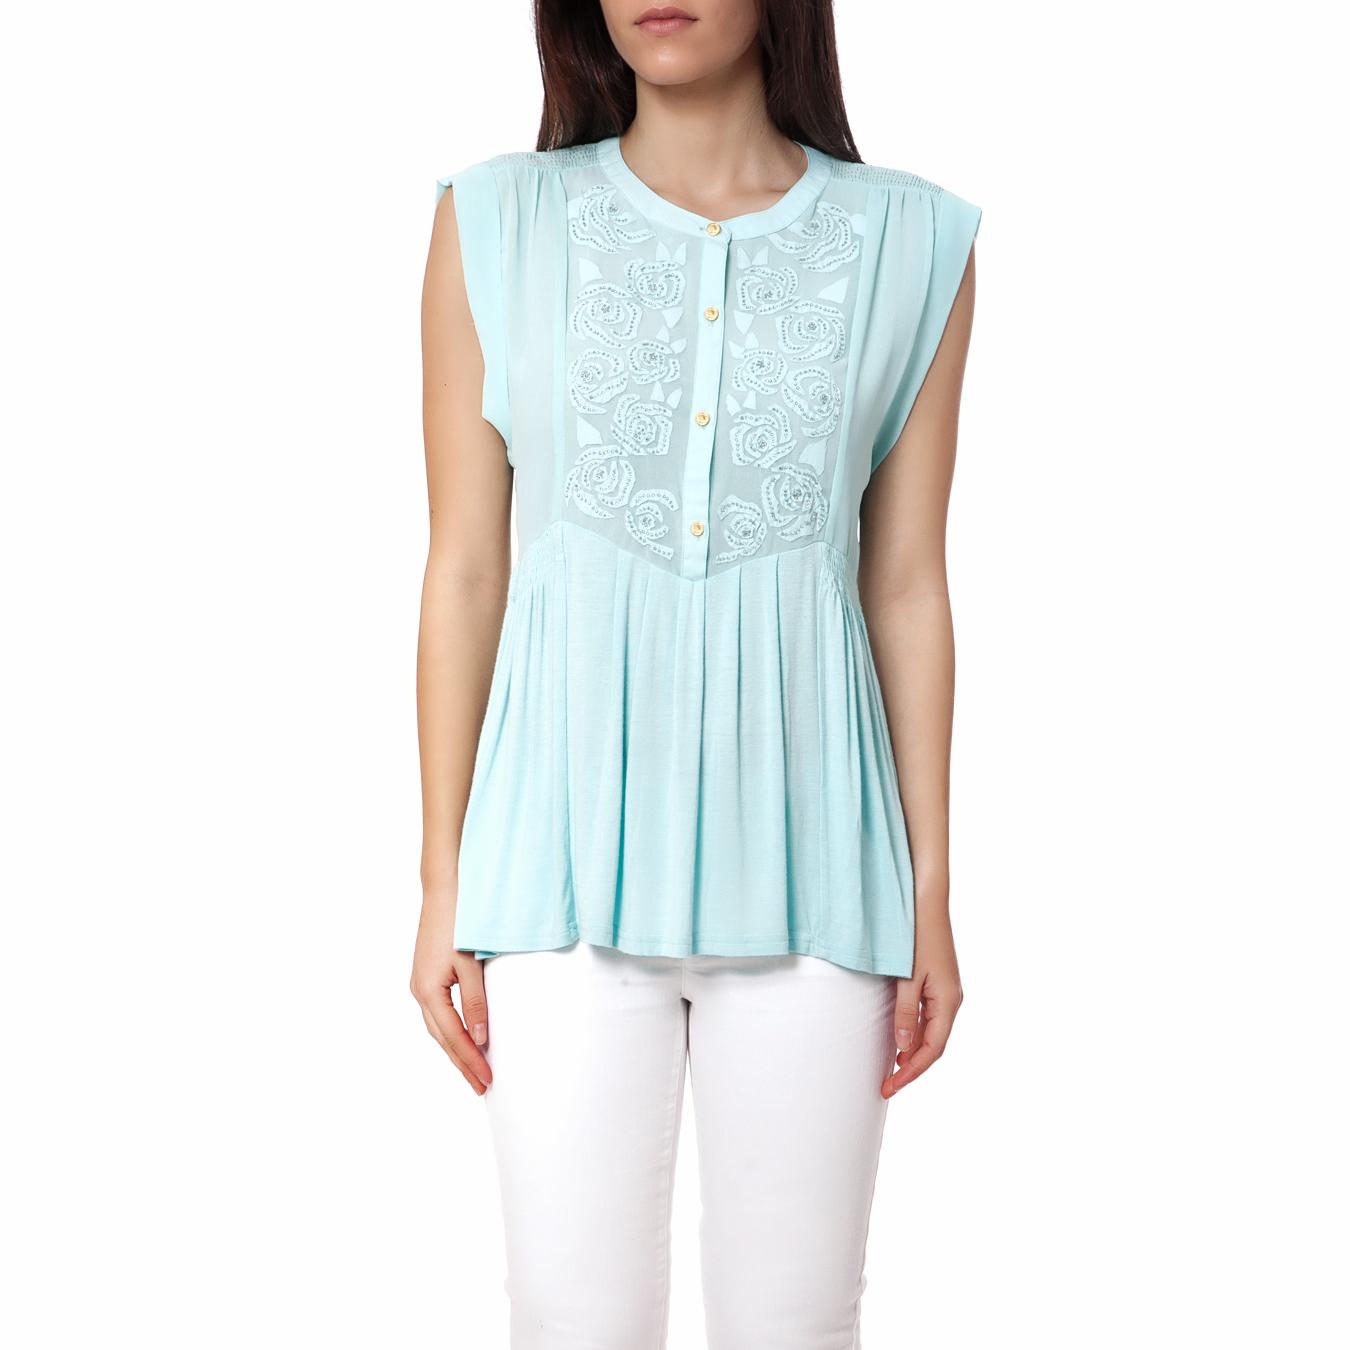 JUICY COUTURE - Γυναικείο πουκάμισο Juicy Couture γαλάζιο γυναικεία ρούχα πουκάμισα κοντομάνικα αμάνικα